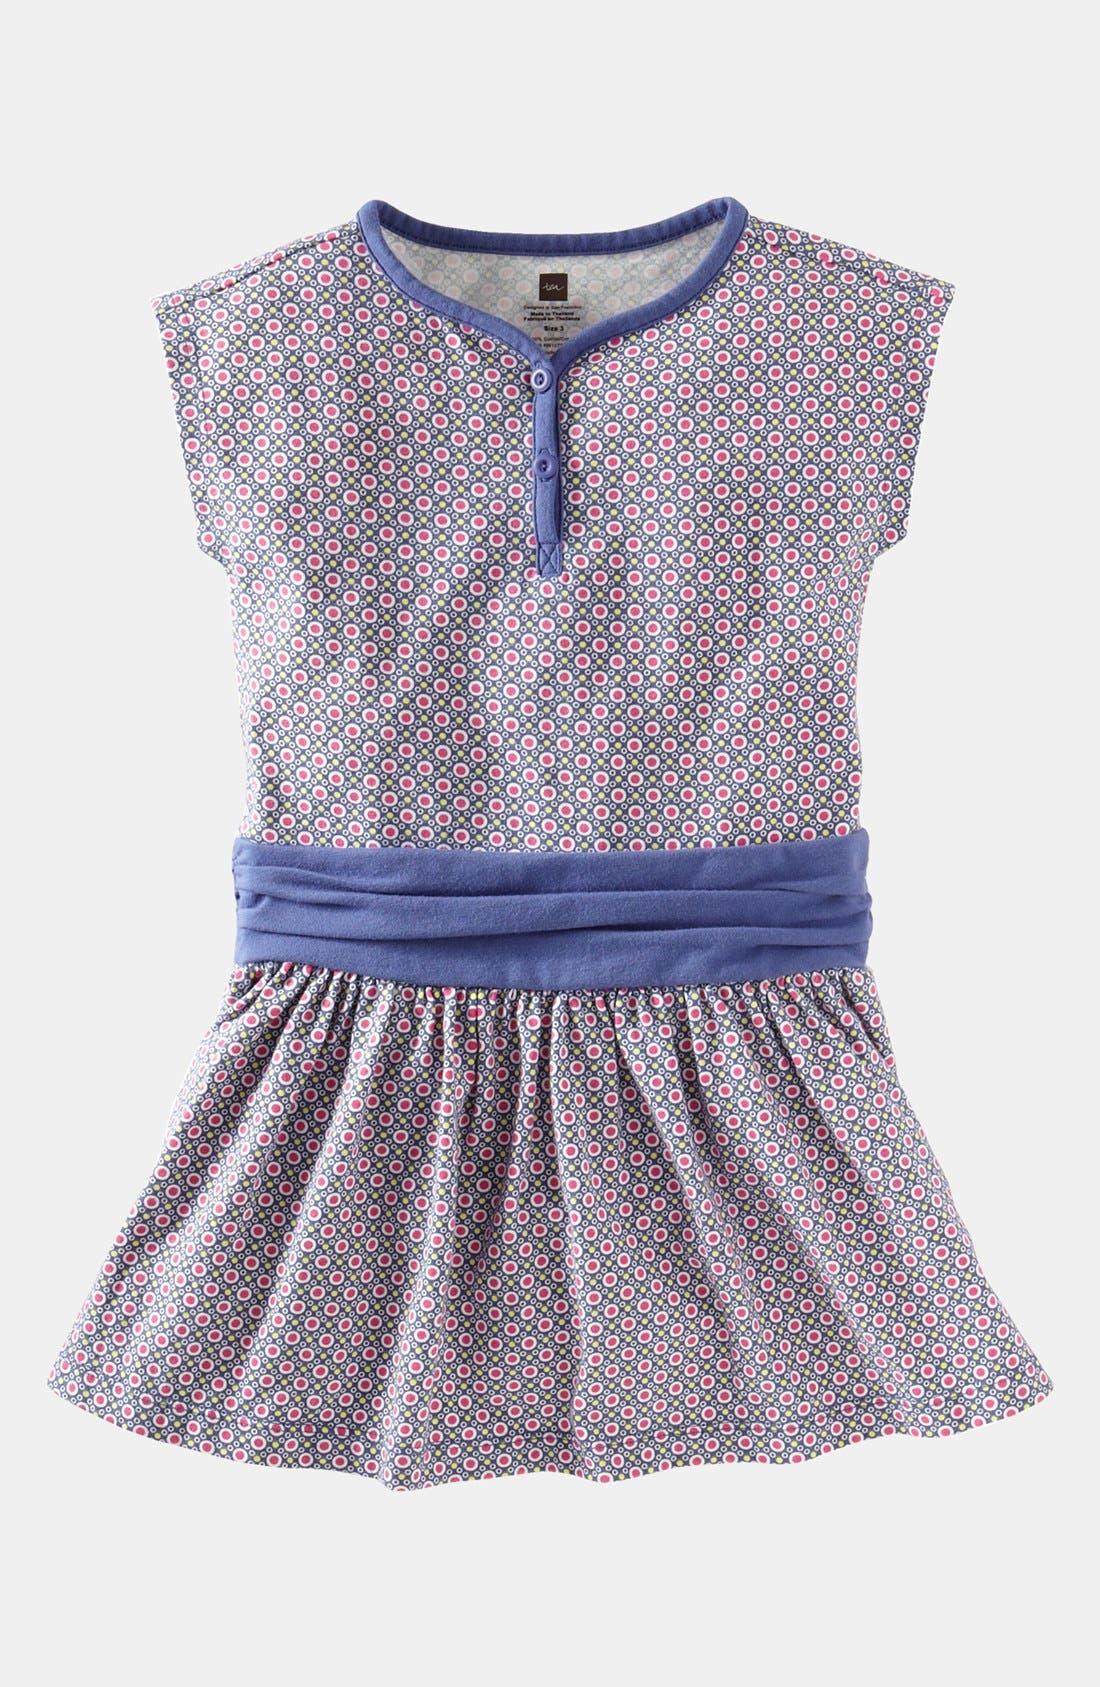 Alternate Image 1 Selected - Tea Collection 'Beijing Dot' Henley Dress (Baby Girls)